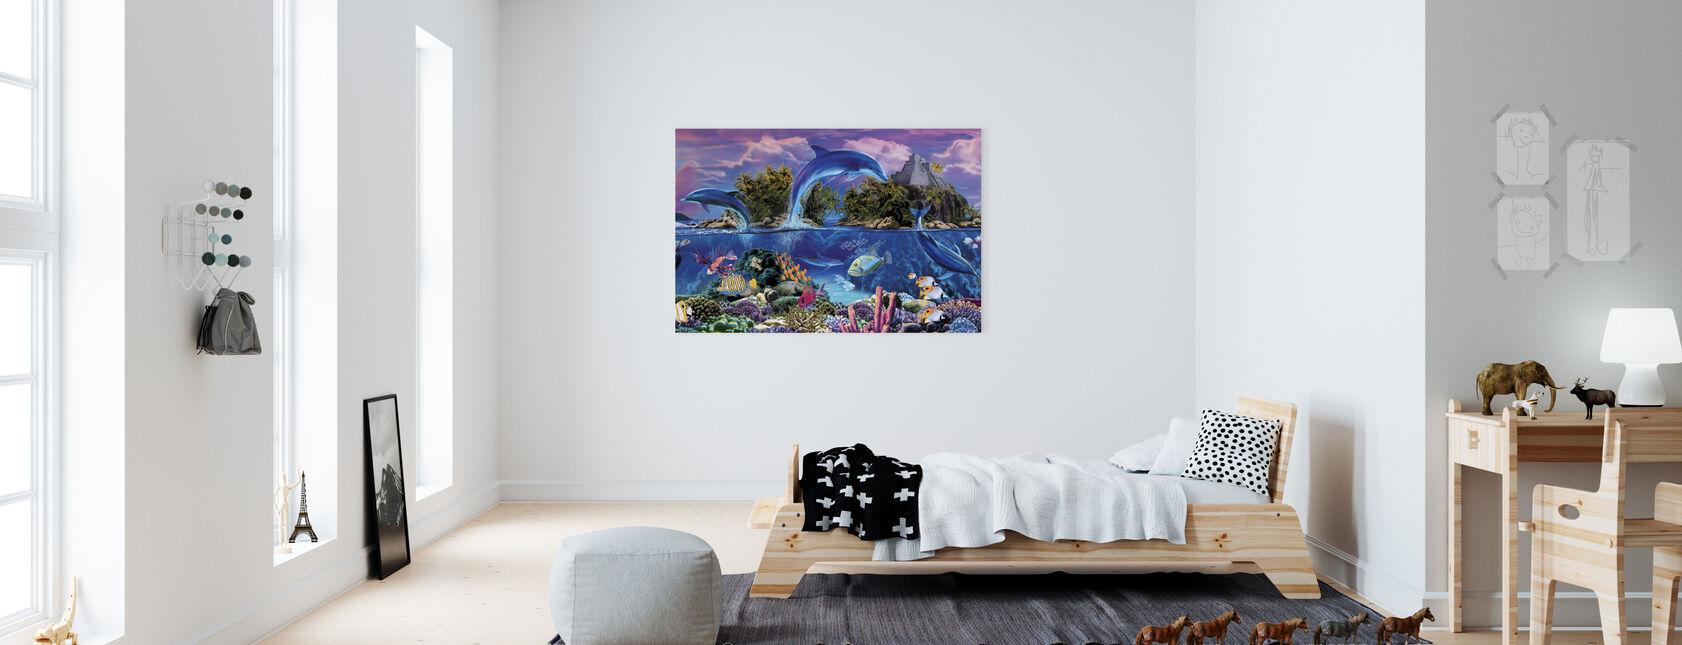 Merenalaiset paikat